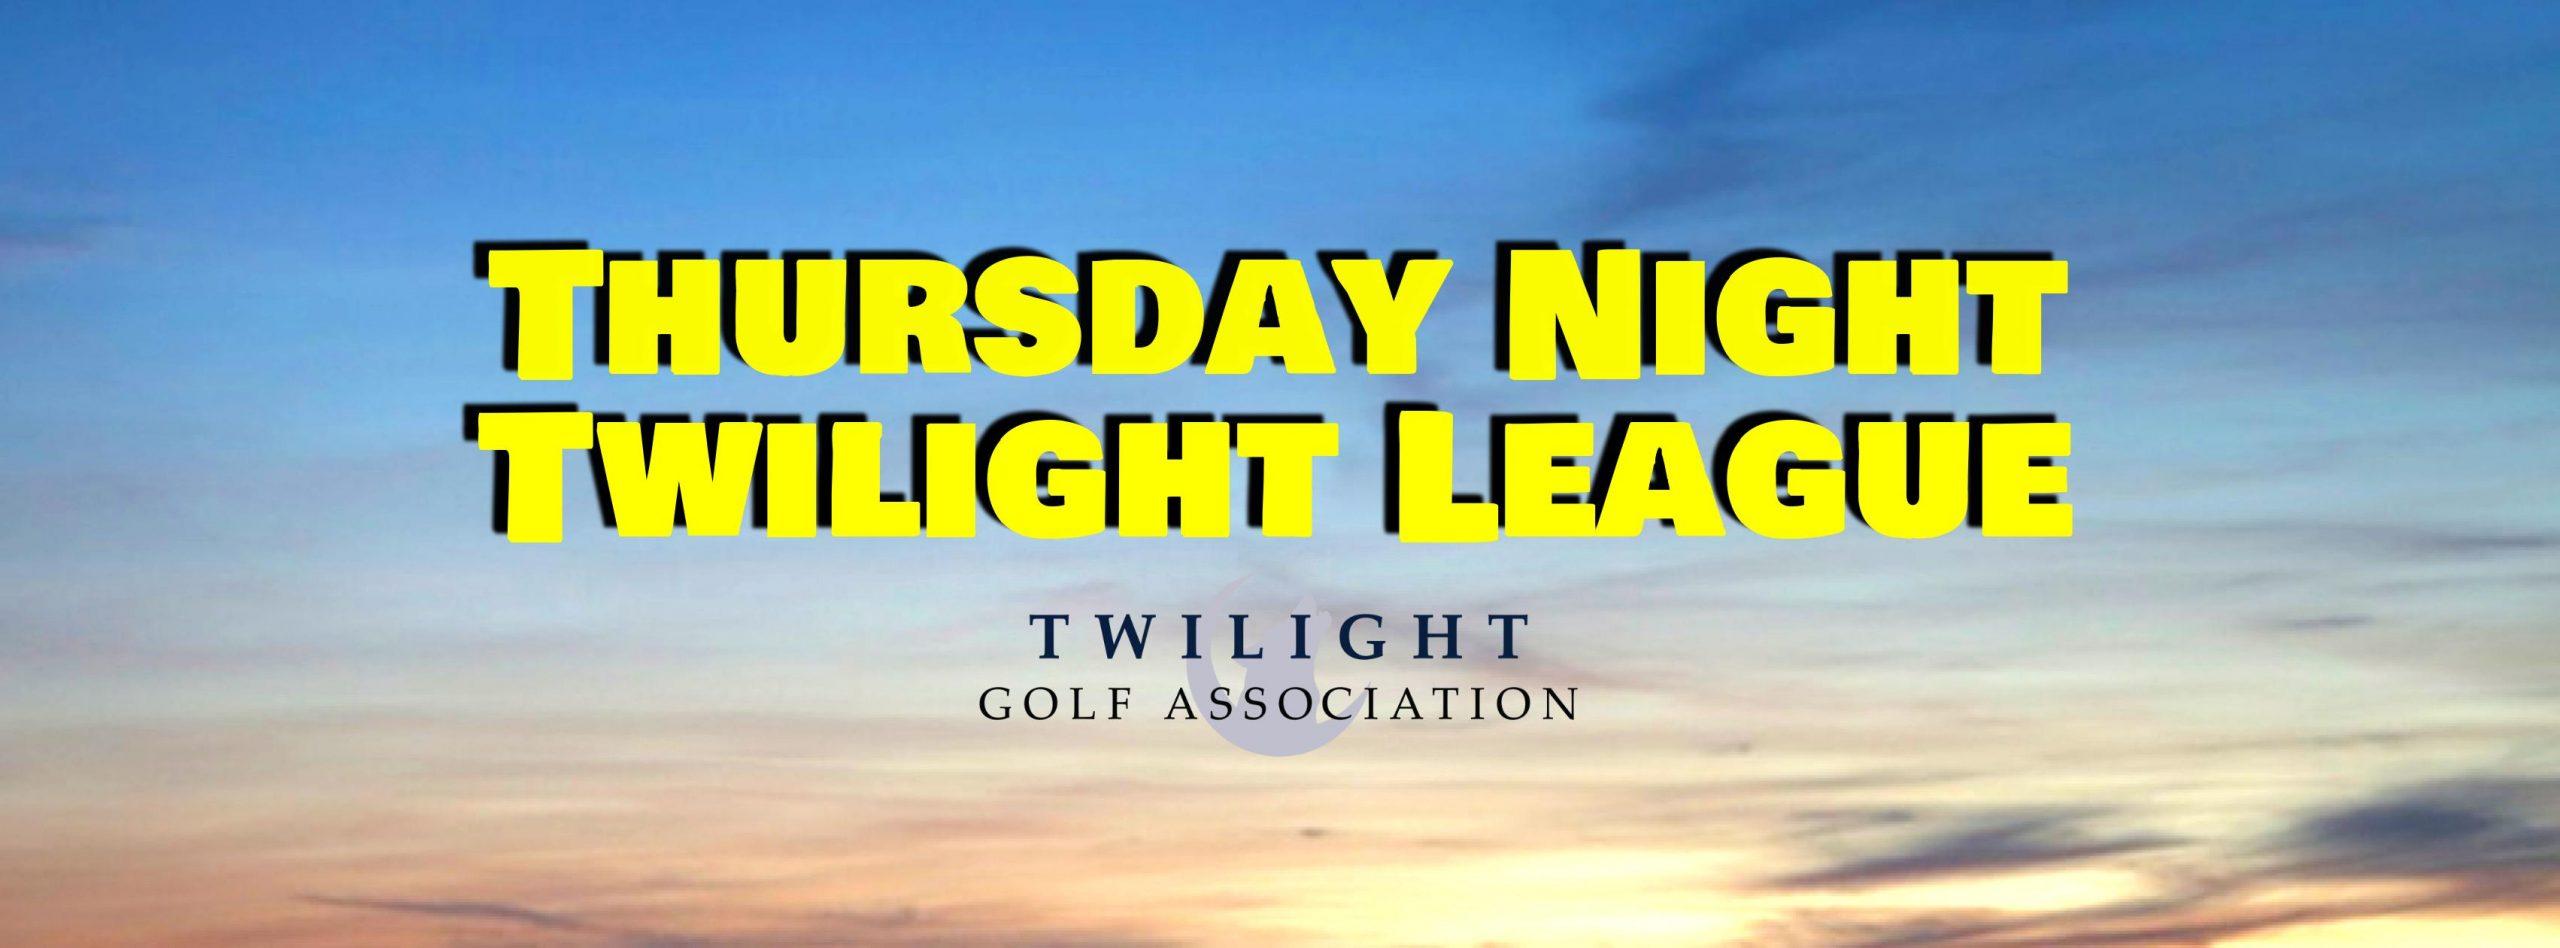 Thursday Night Twilight League at Rancocas Golf Club